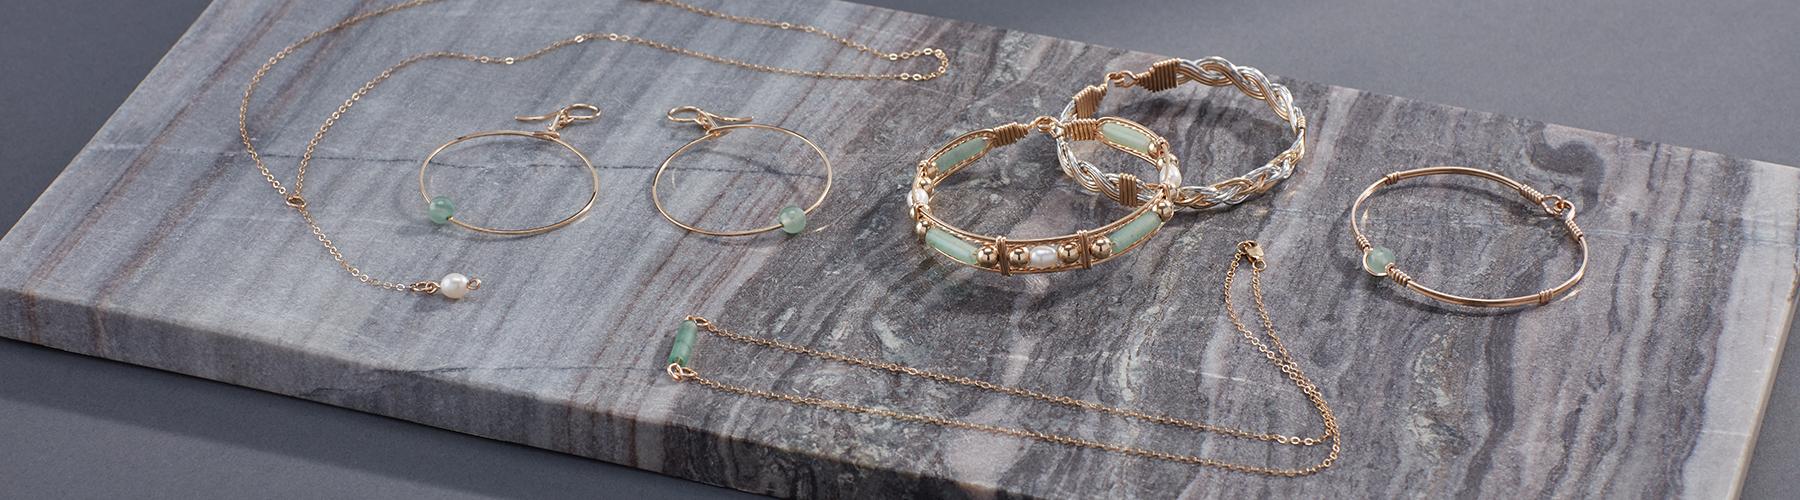 alljewelry-2-copy.jpg